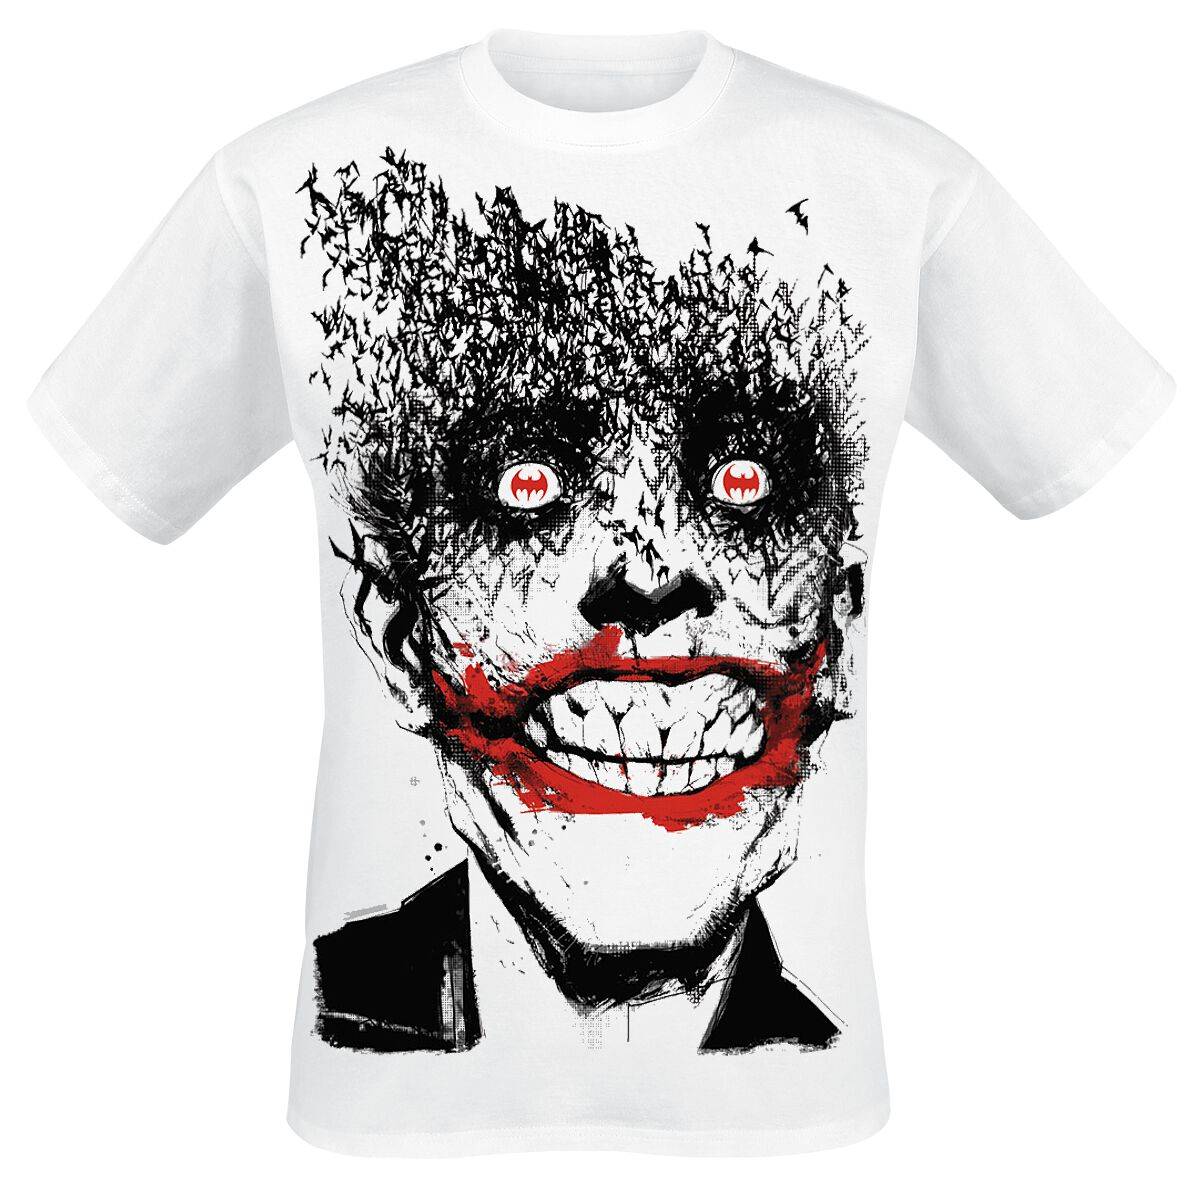 Merch dla Fanów - Koszulki - T-Shirt The Joker Smile T-Shirt biały - 283579